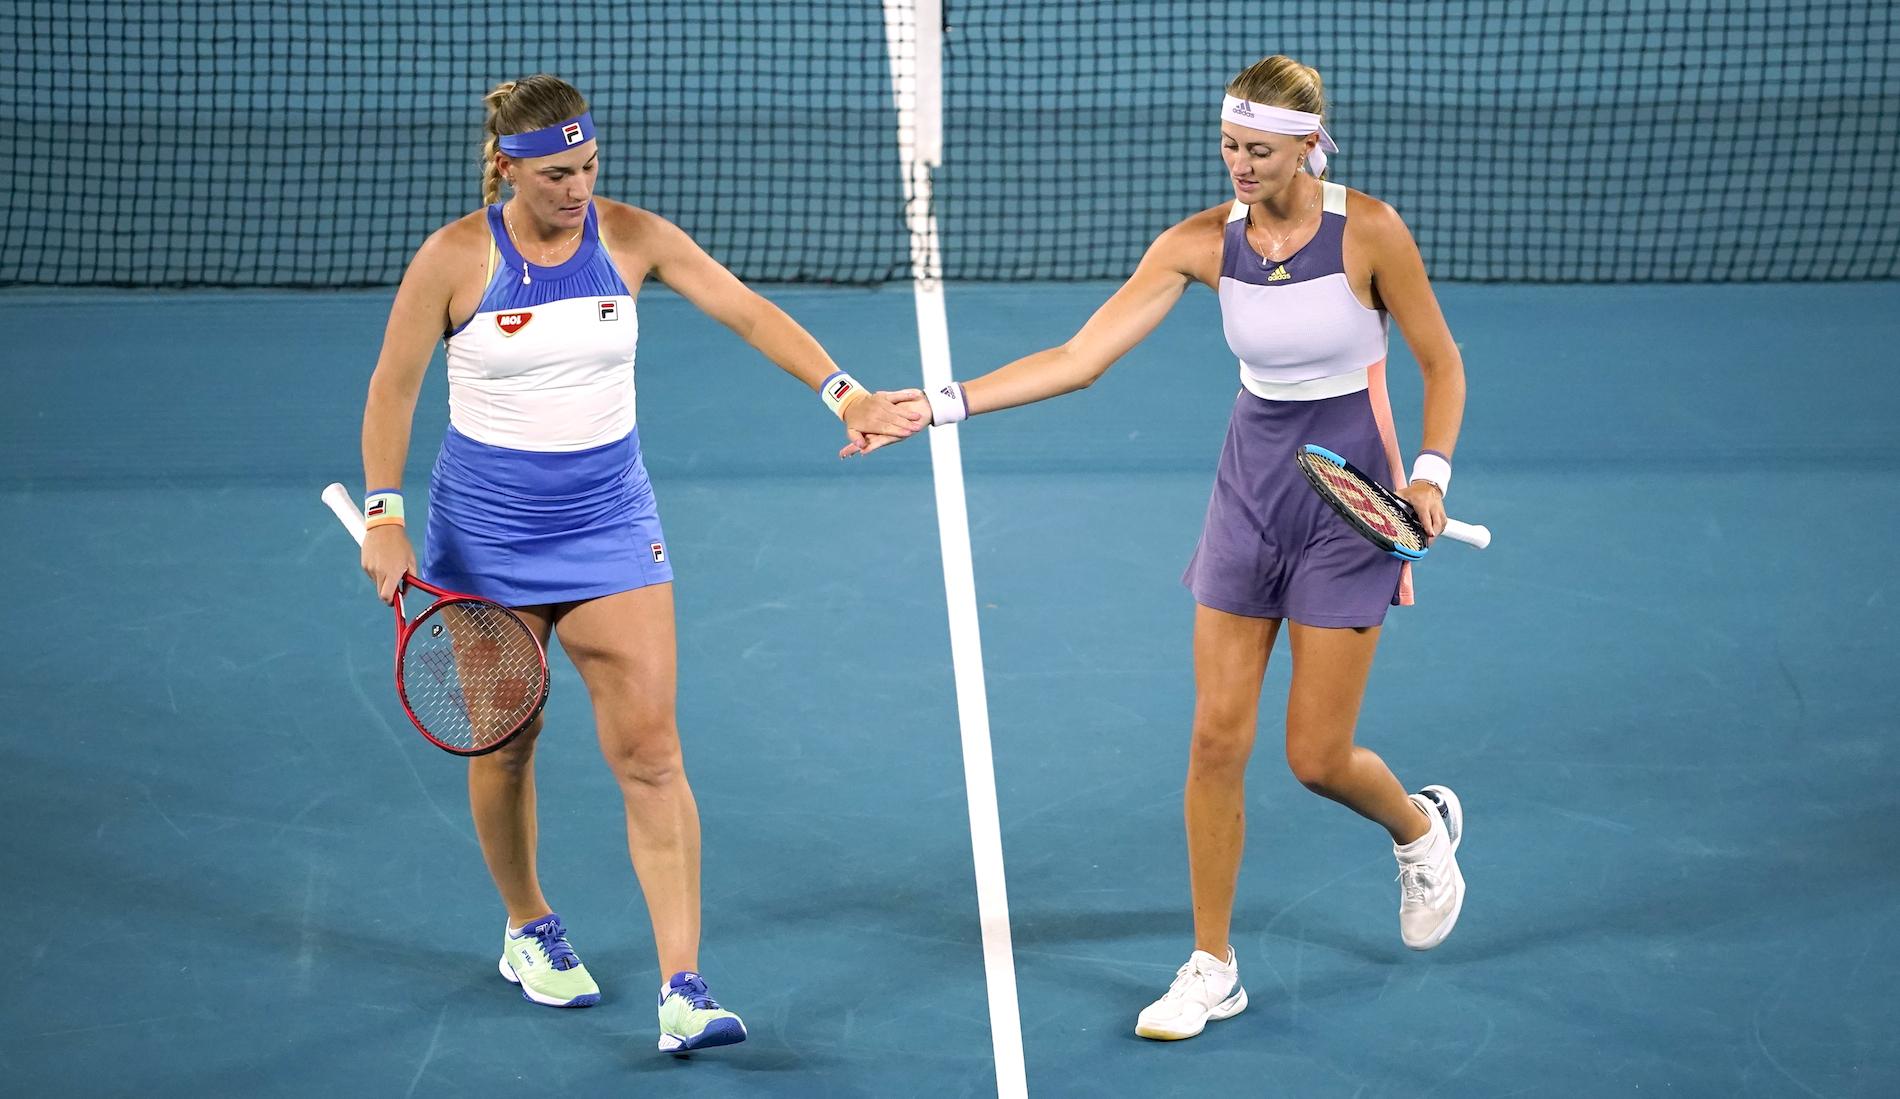 Kristina Mladenovic and Timea Babos